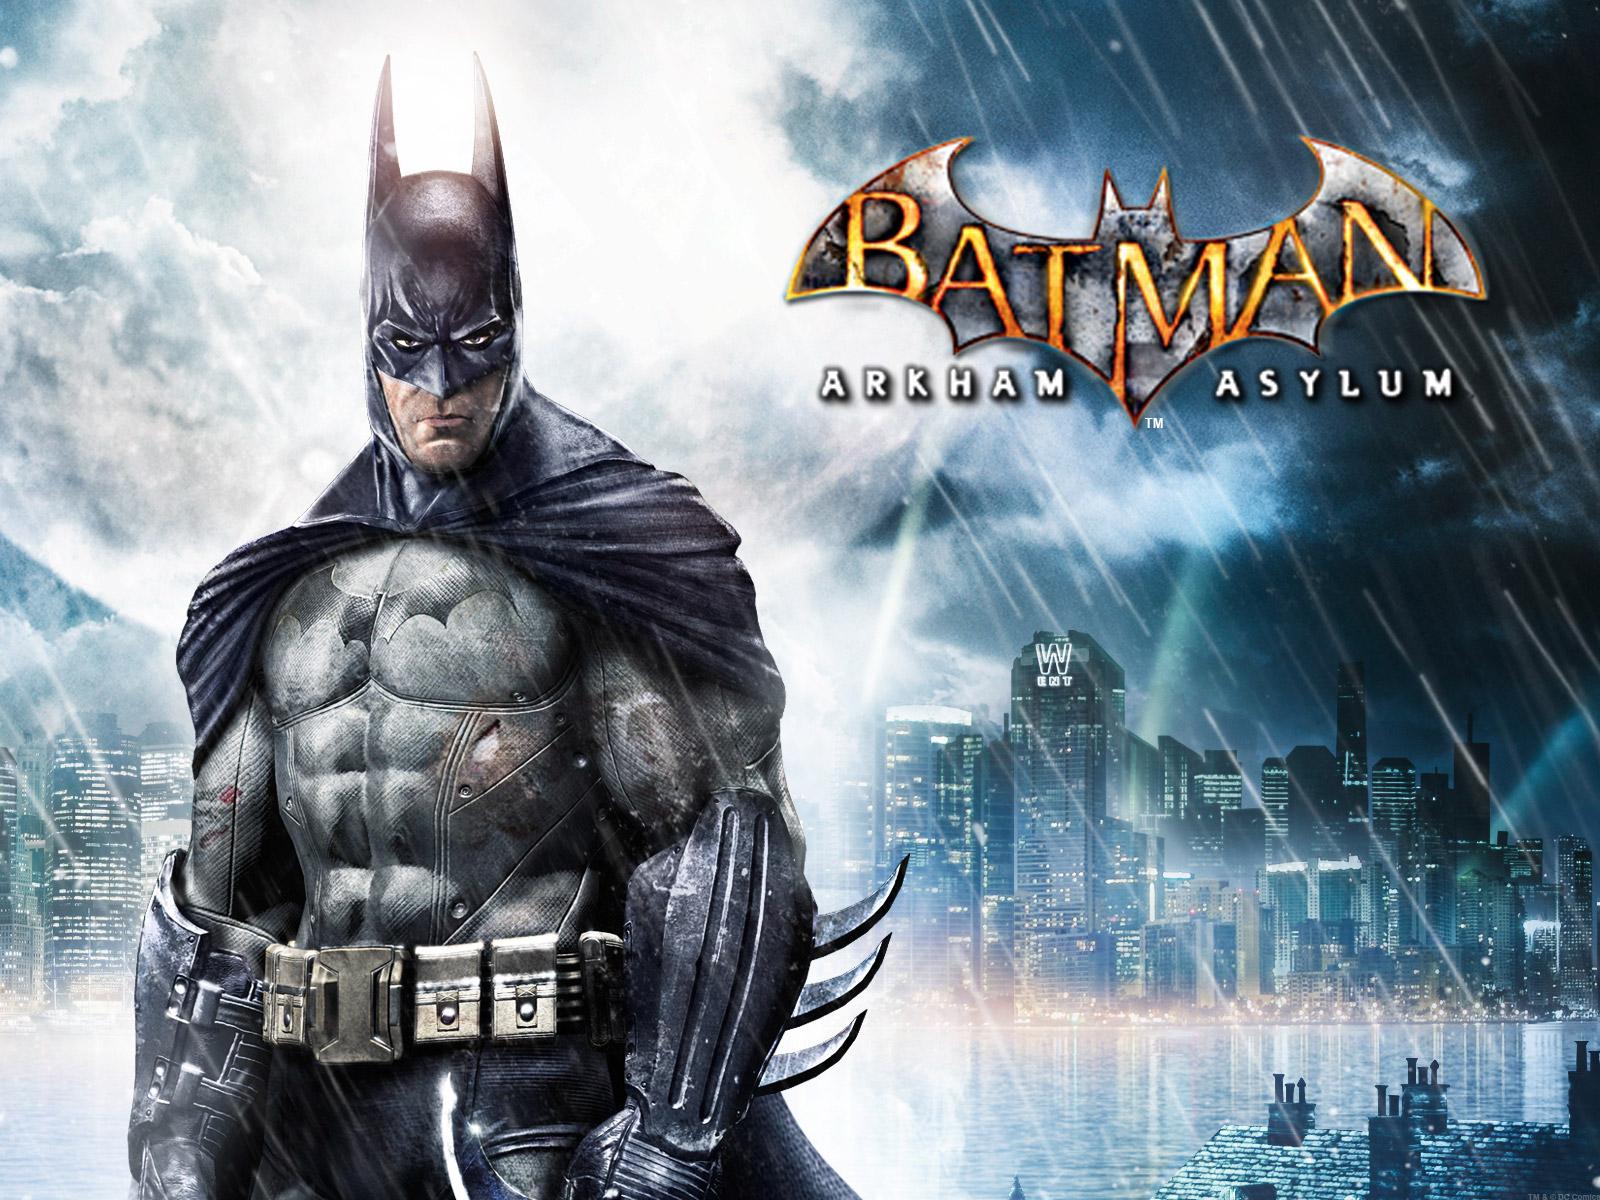 Batman Arkham Asylum 2 Wallpapers HD Wallpapers 1600x1200